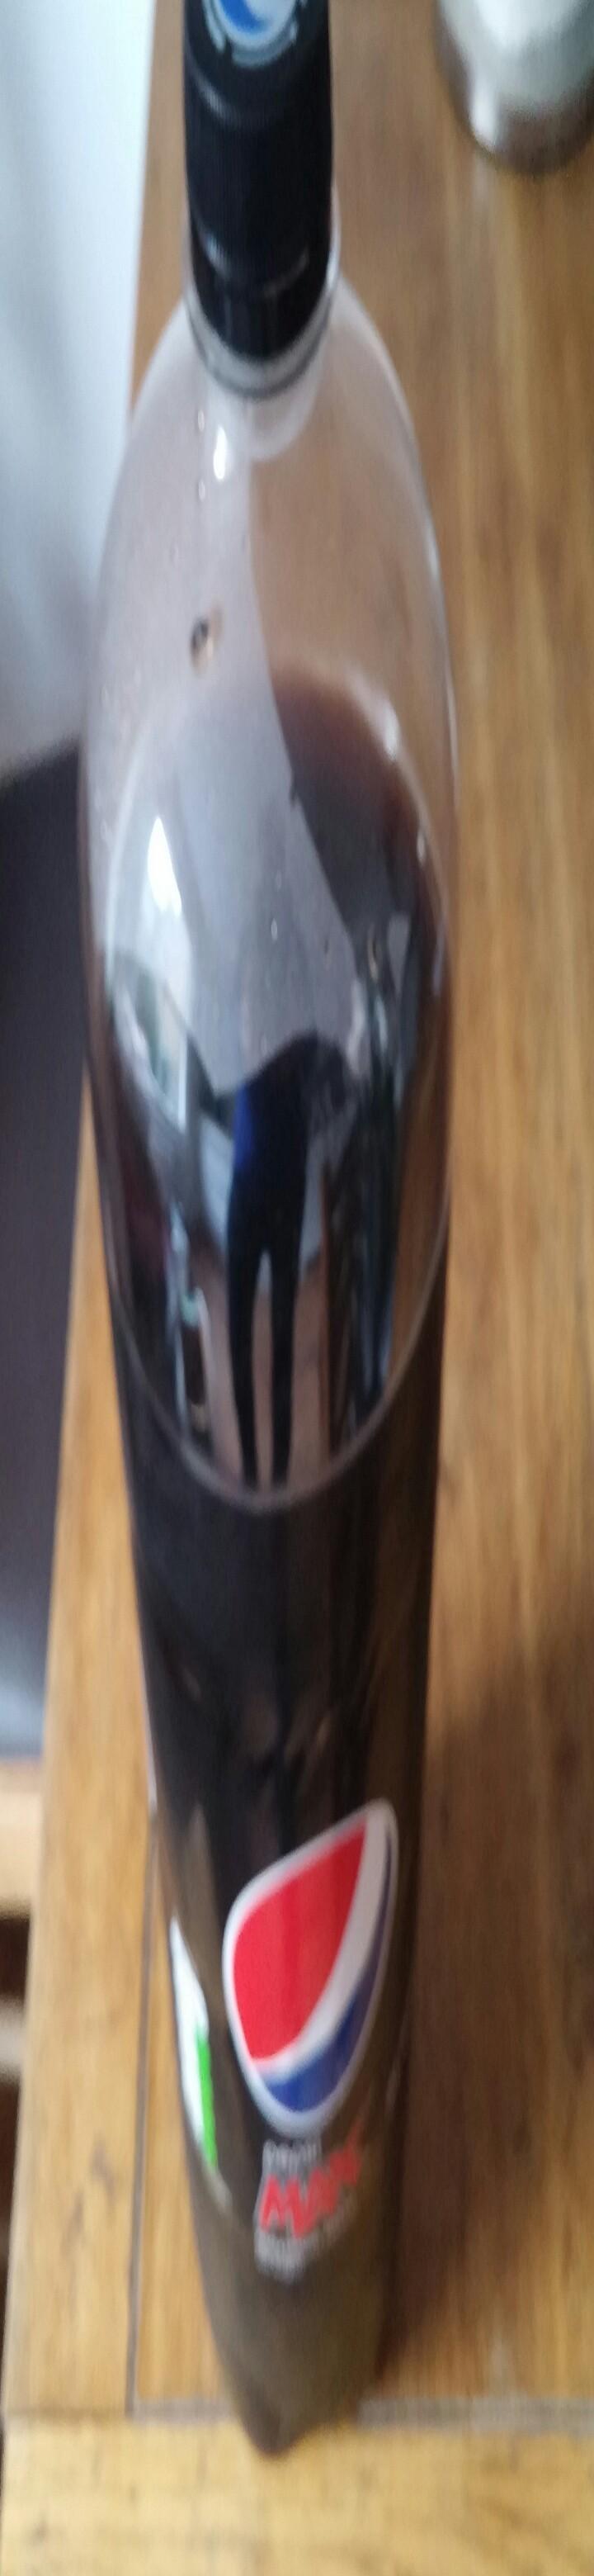 Free opened bottle of Pepsi max